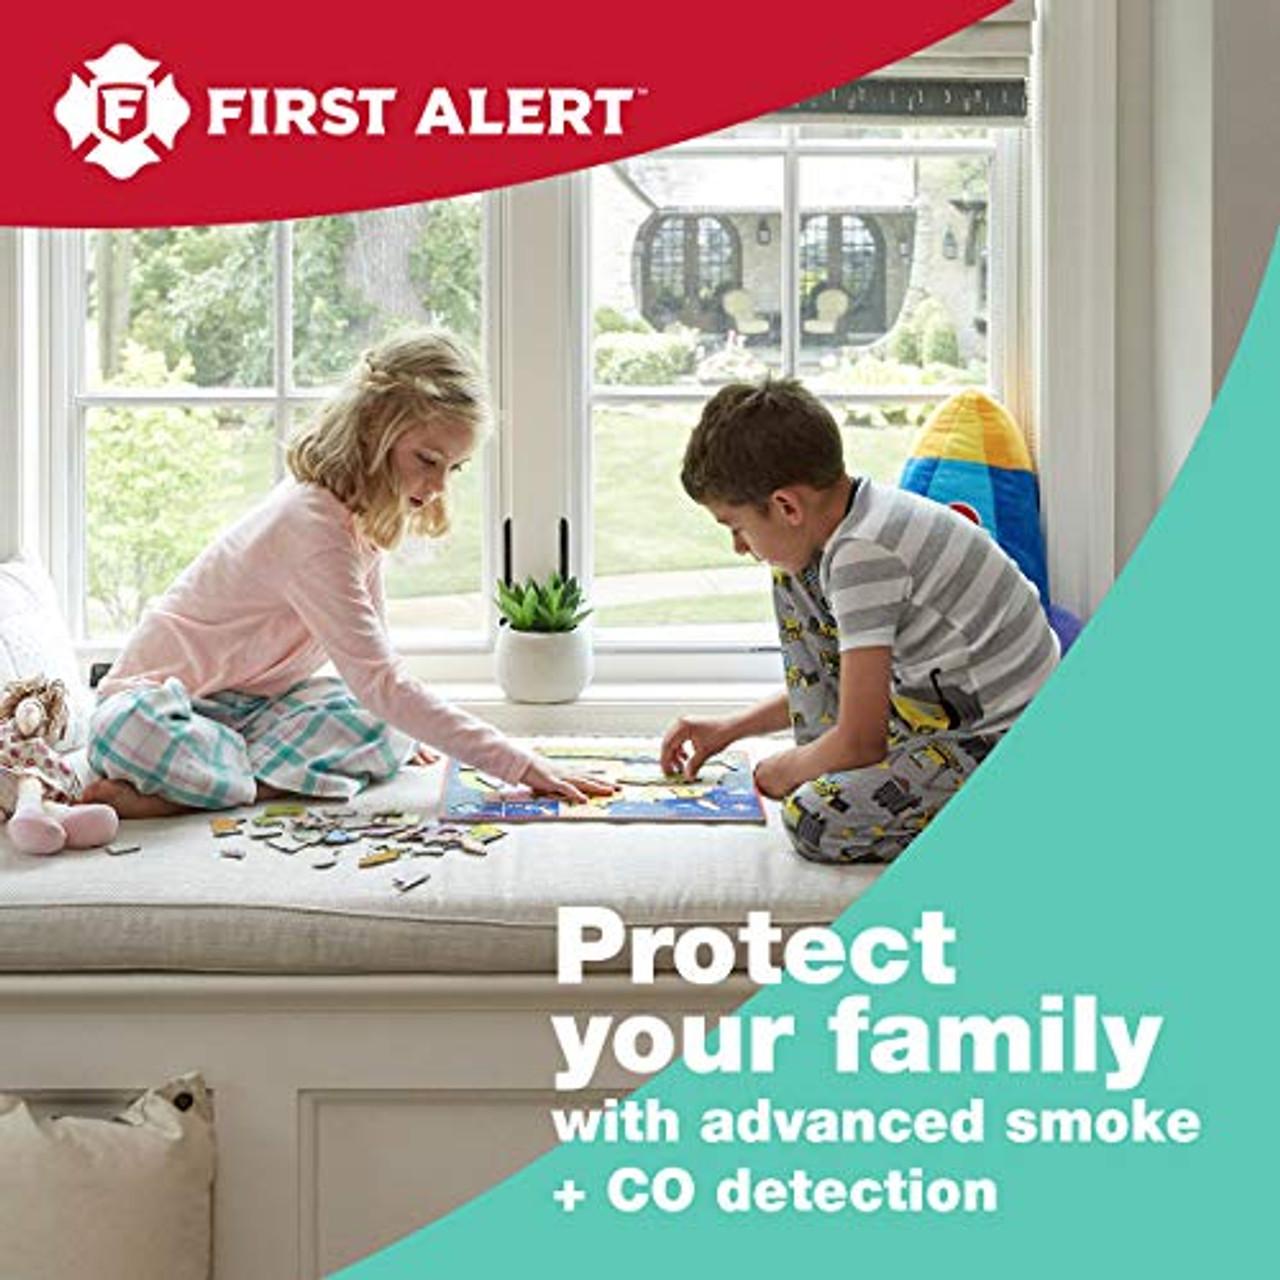 First Alert ZCOMBO 2-in-1 Smoke Detector & Carbon Monoxide Alarm, Z-Wave Combo